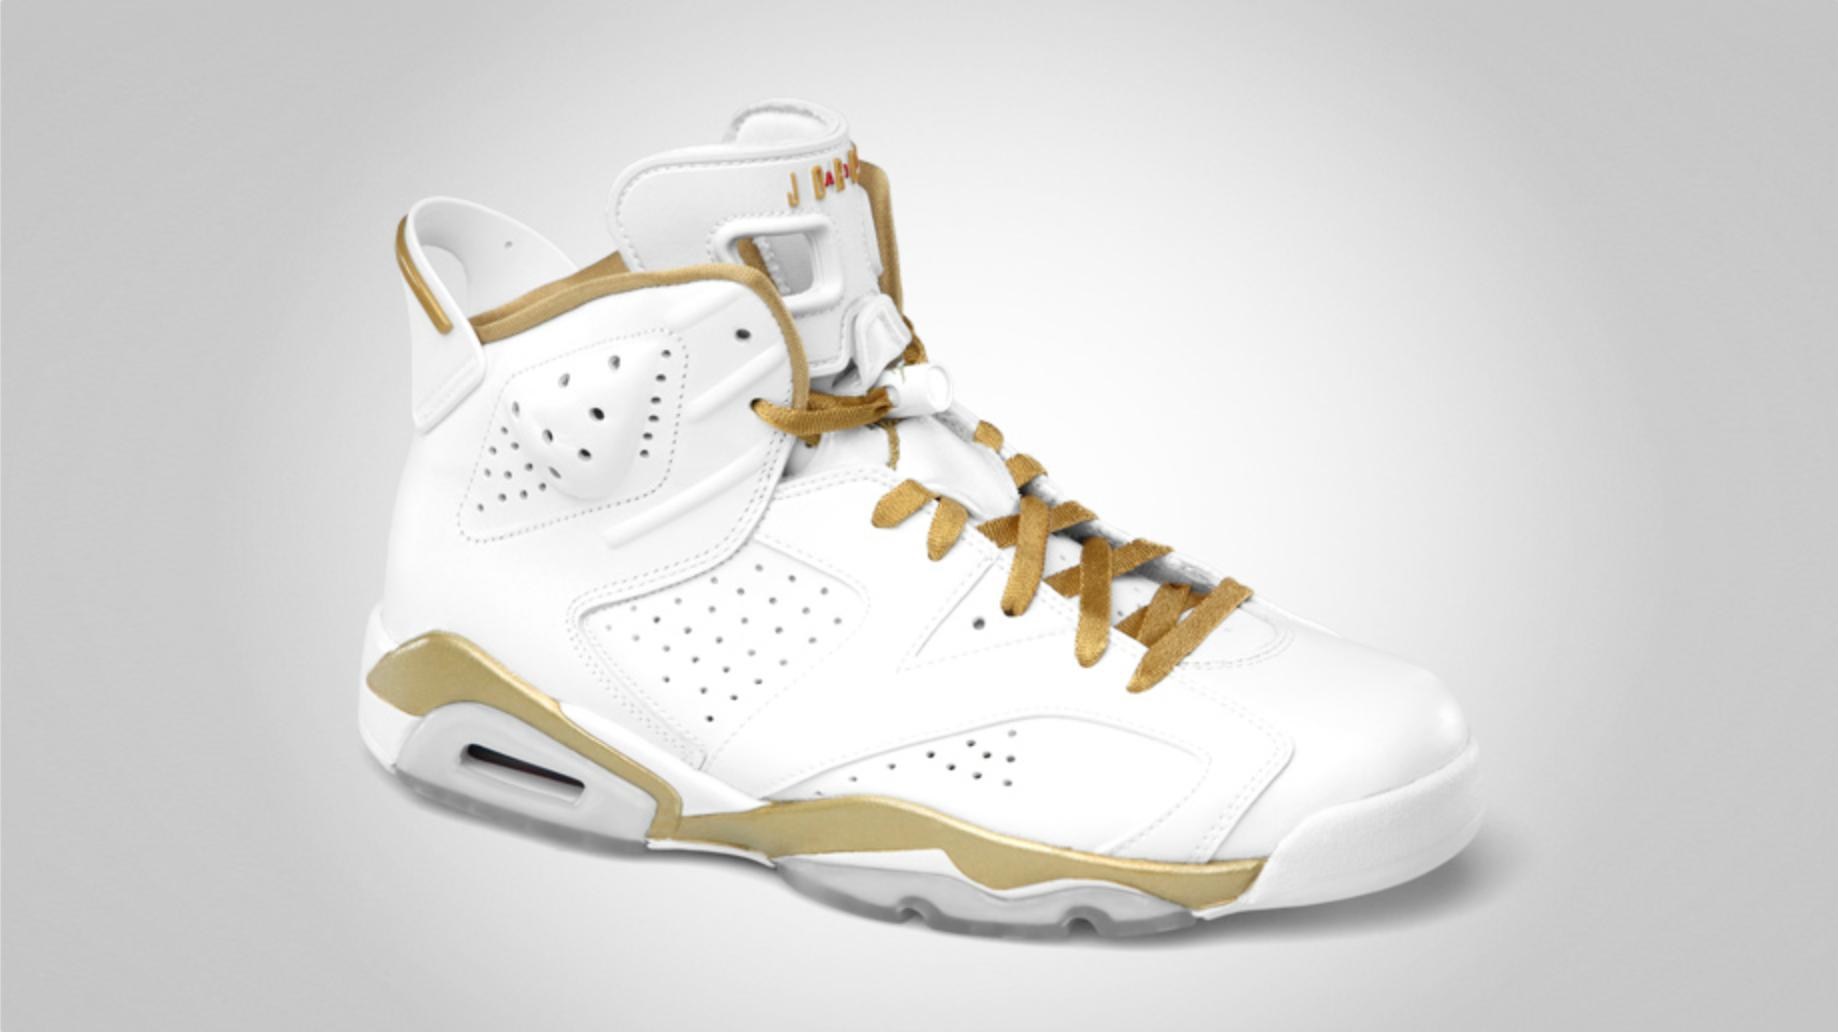 Air Jordan 6 Golden Moments - Official Images